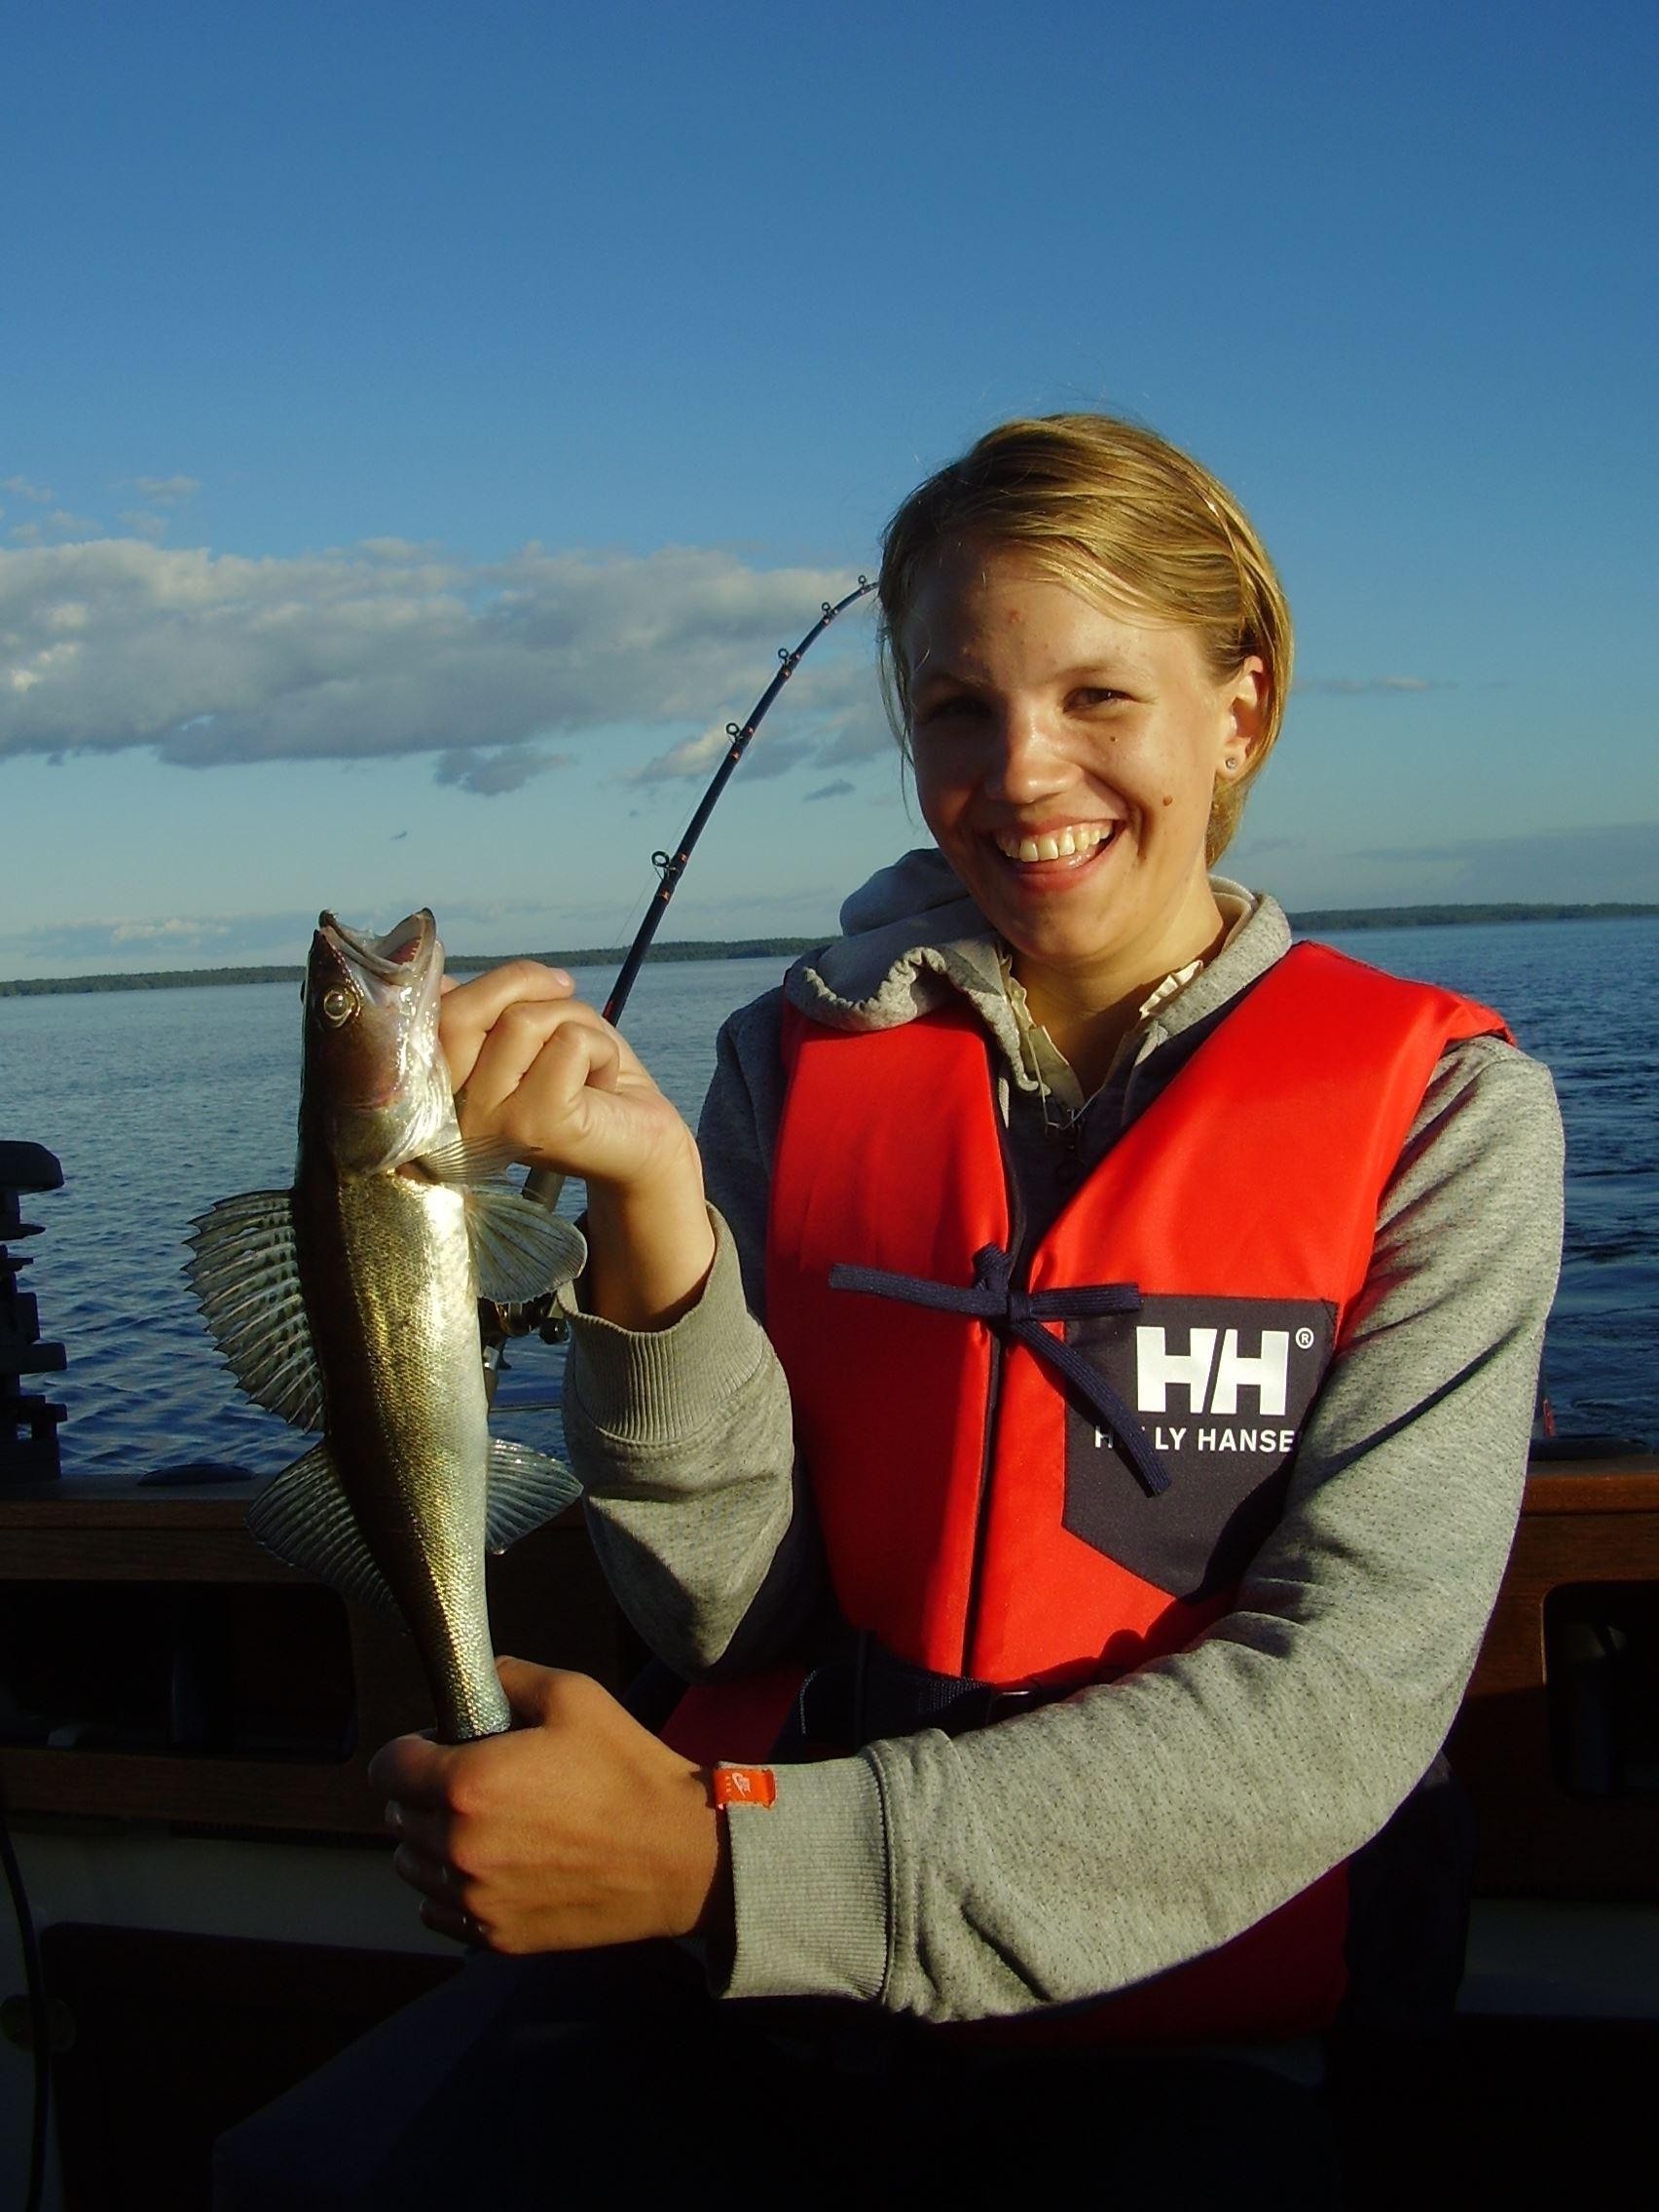 Fishing in Torpa-Hinneryd